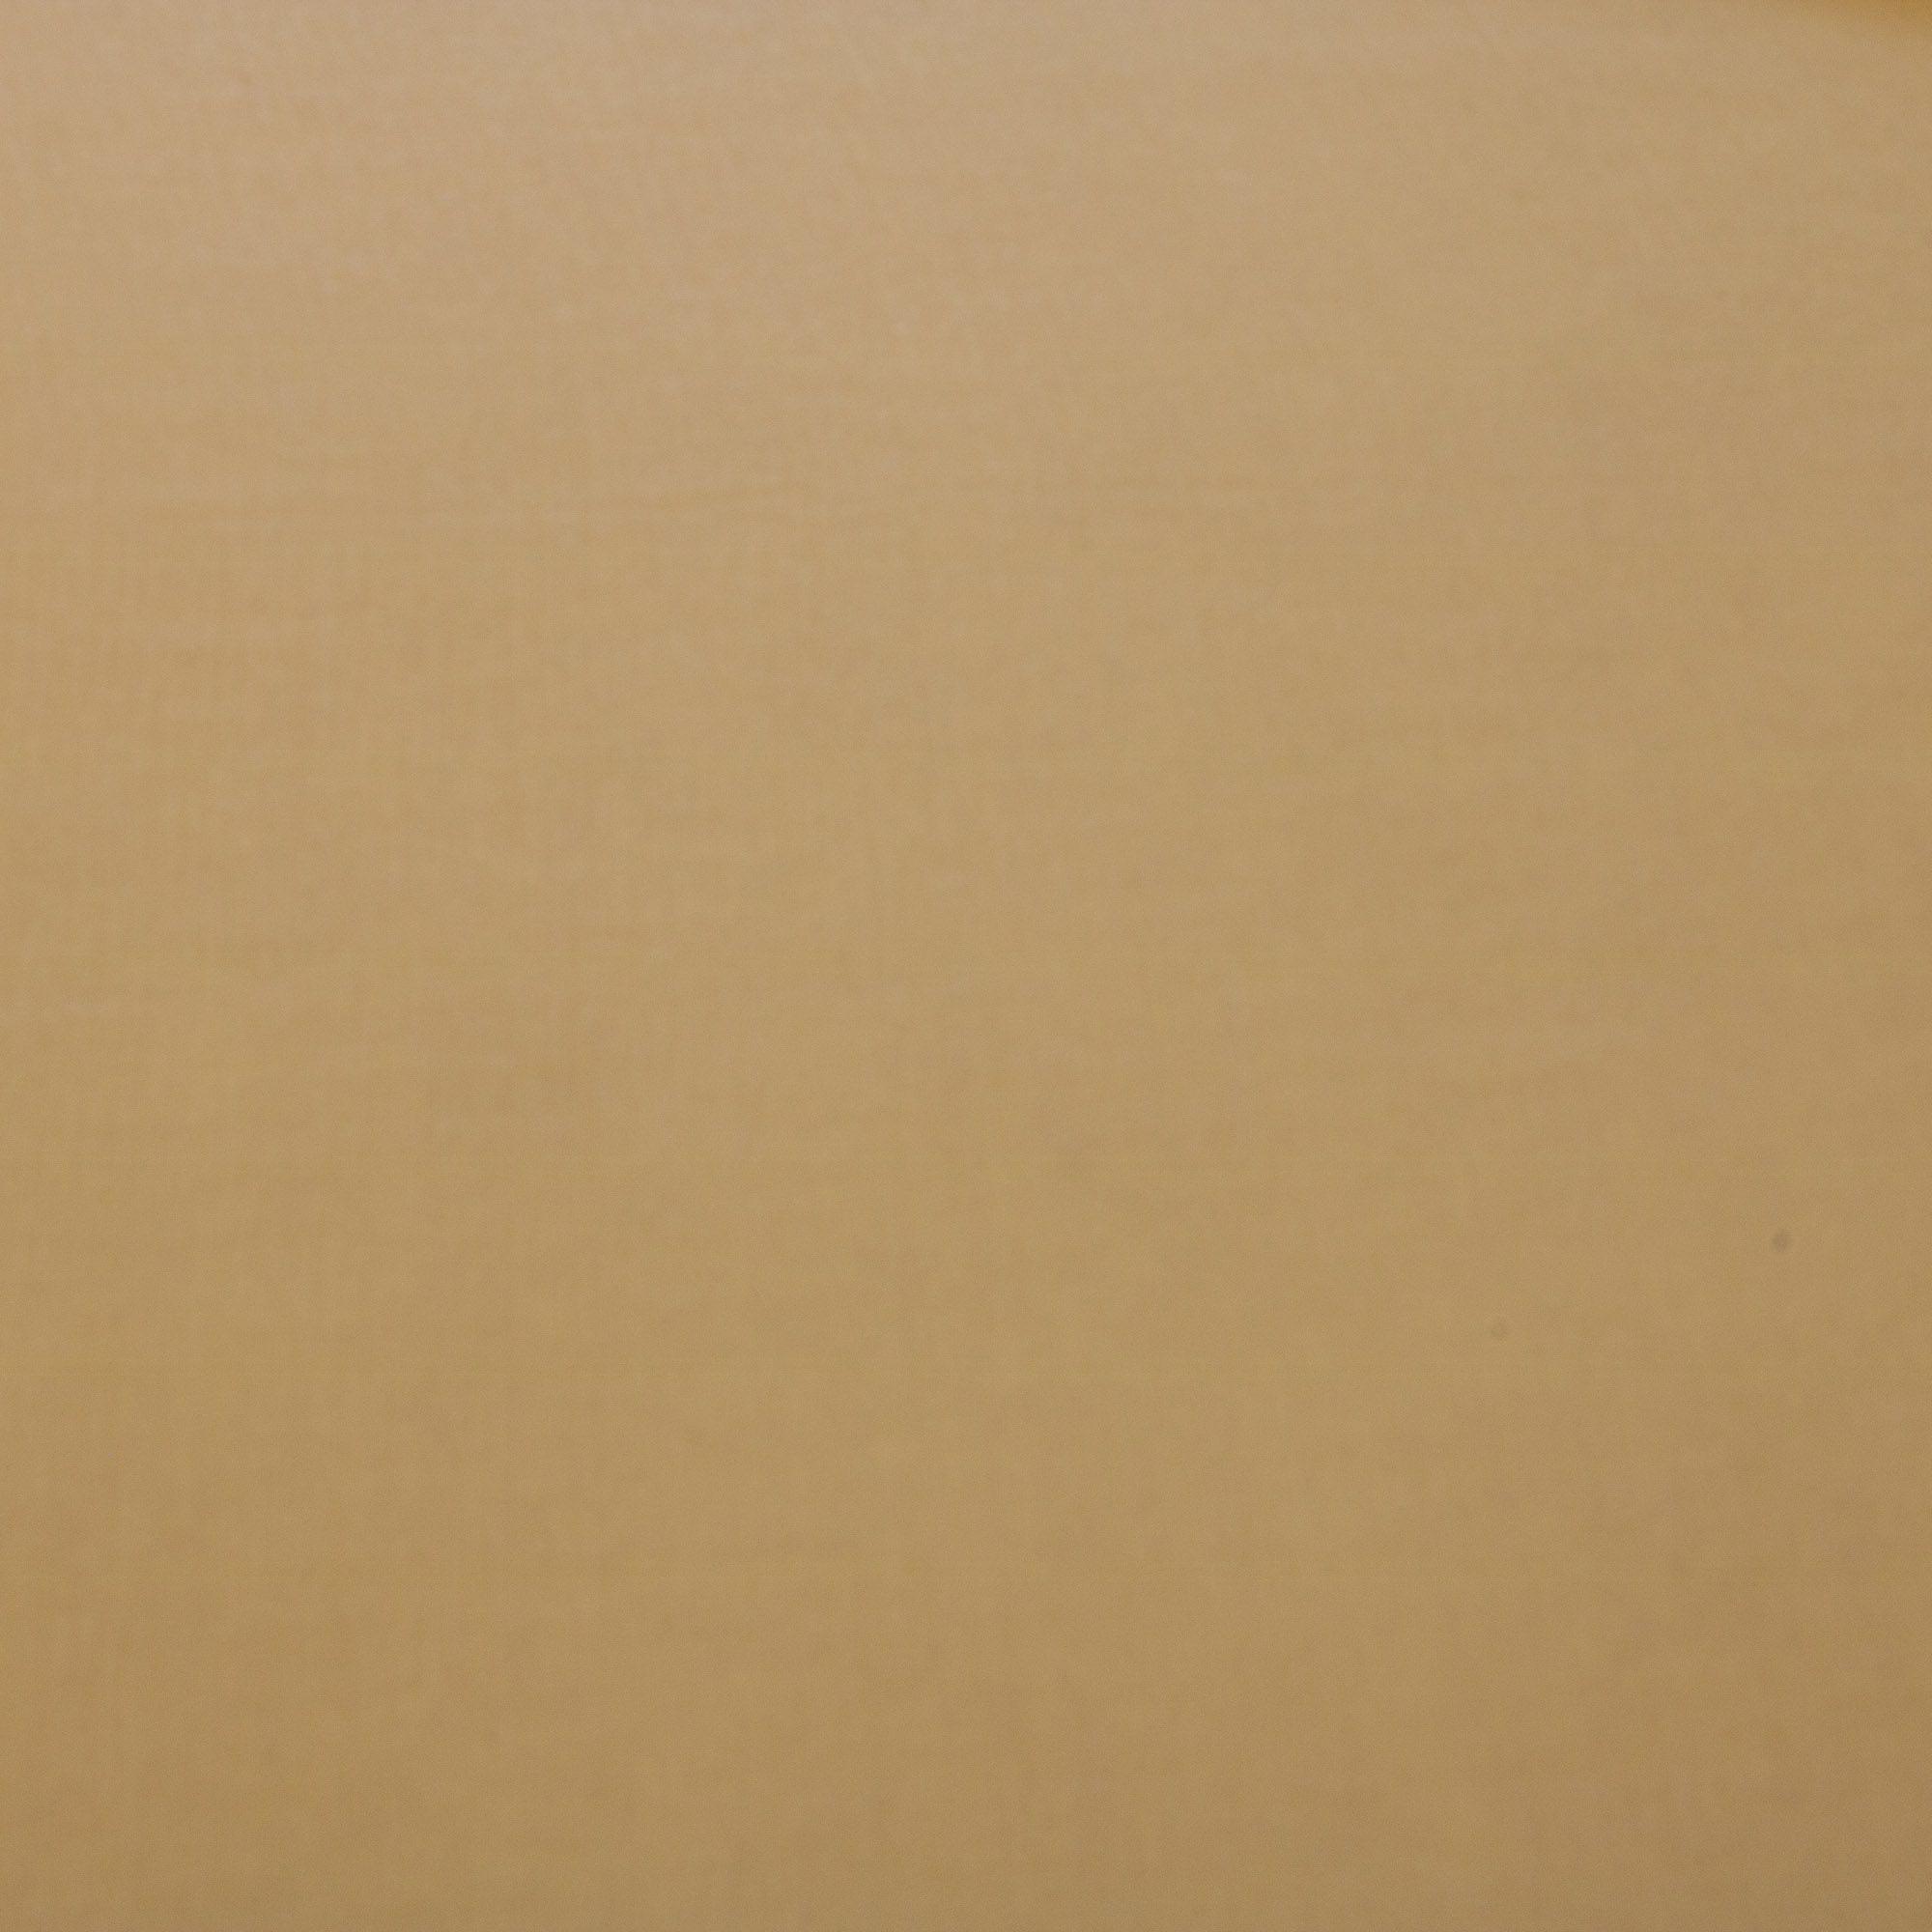 Tecido Viscose Bege 100% Viscose 1,40 m Largura